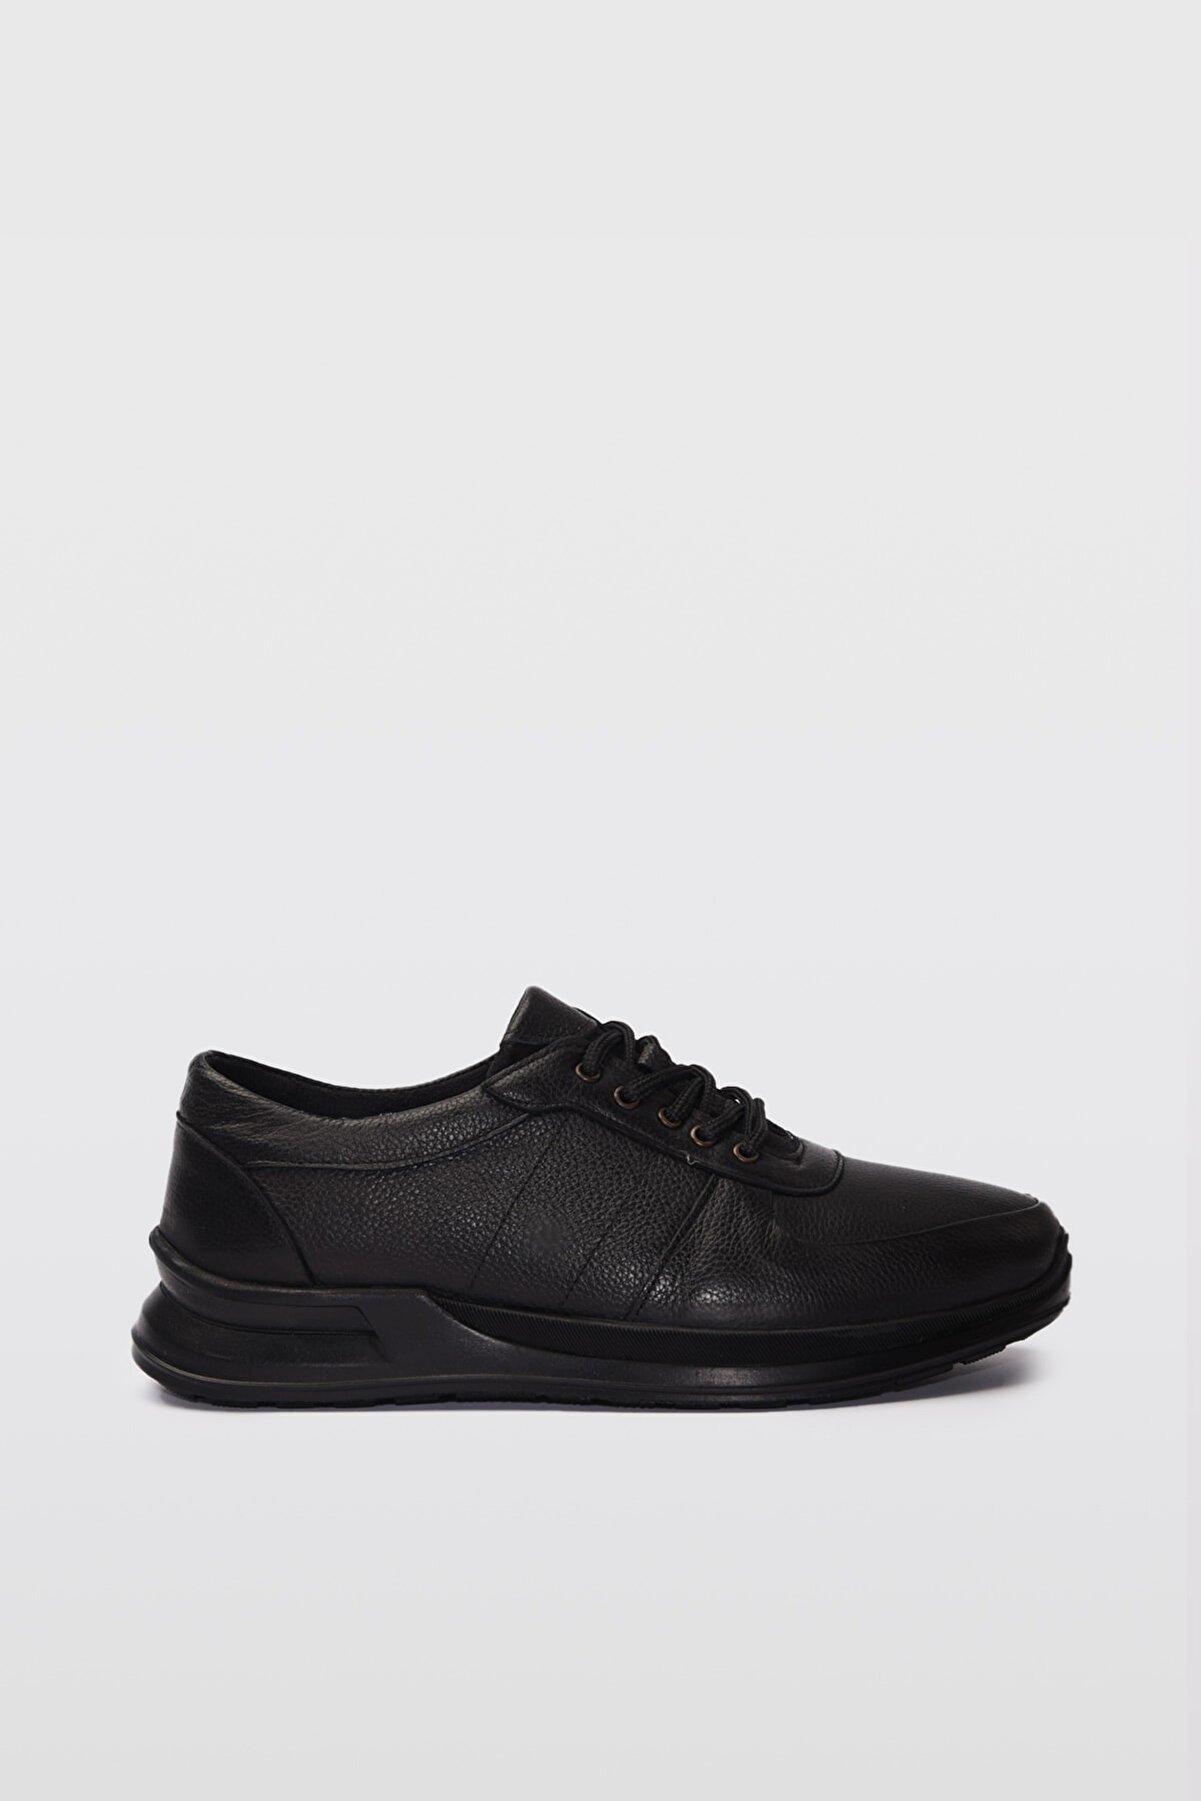 Yaya by Hotiç Hakiki Deri Siyah Erkek Sneaker 02AYY189620A100